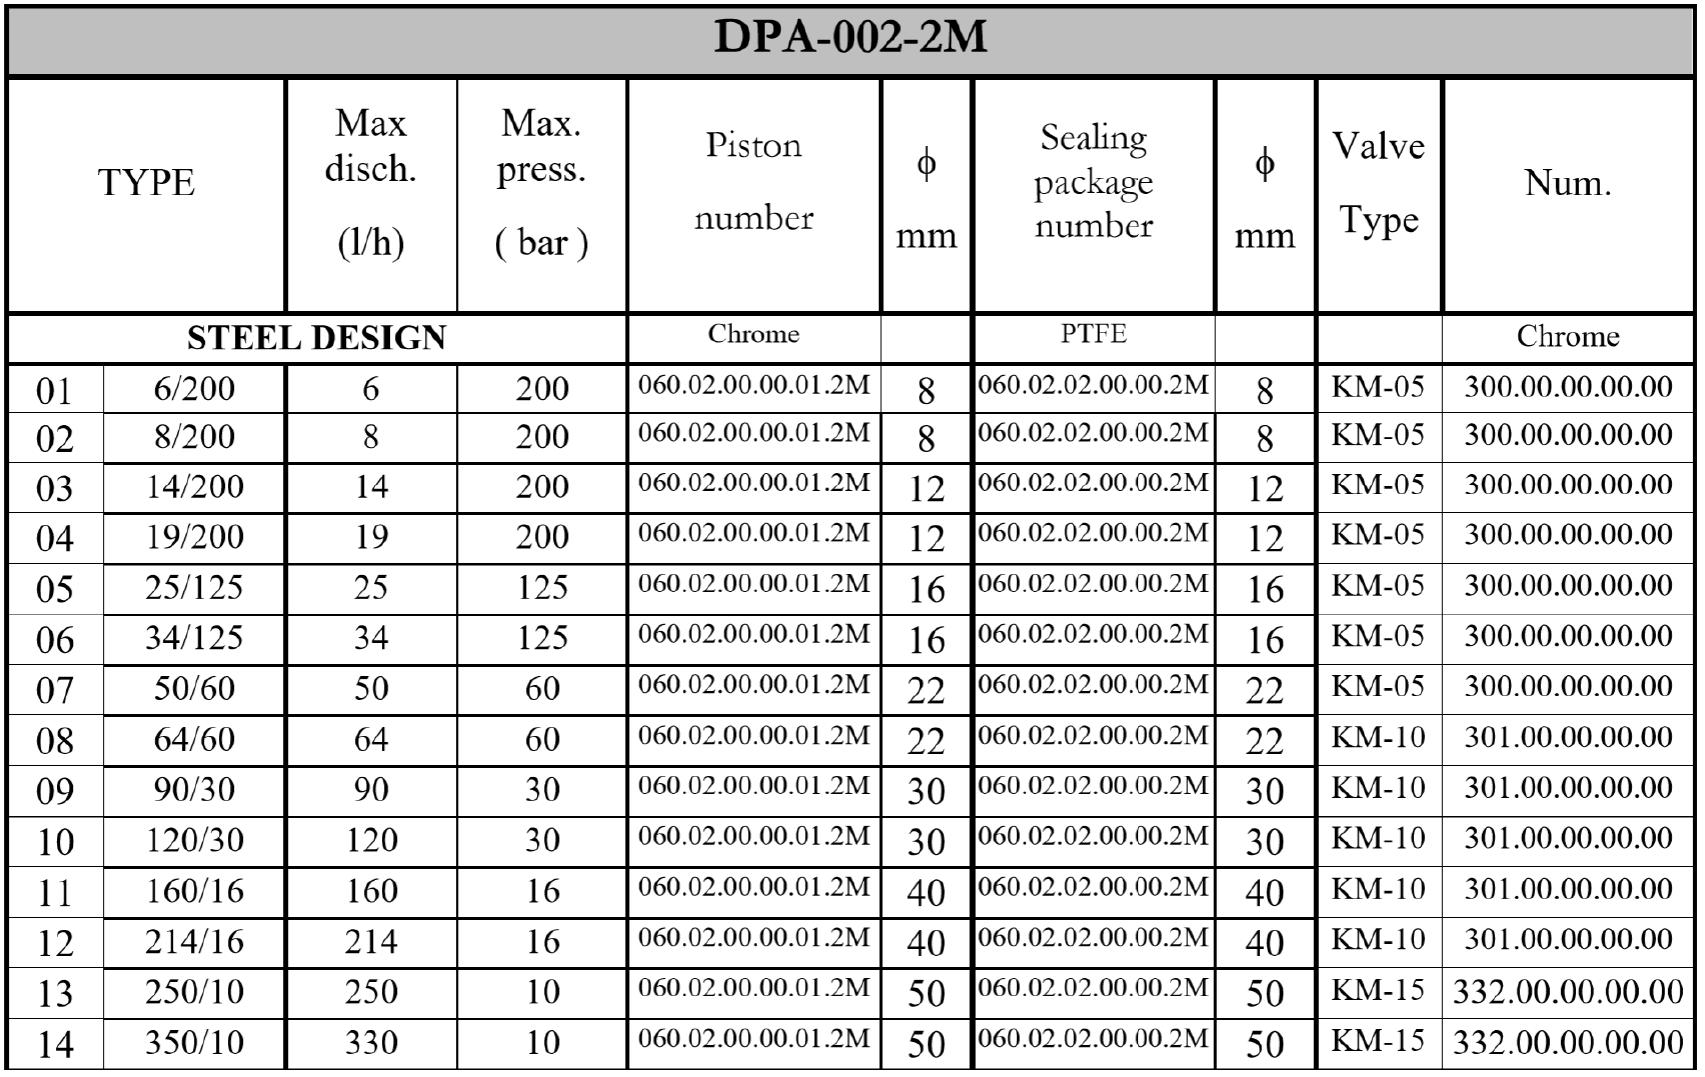 tablica 03